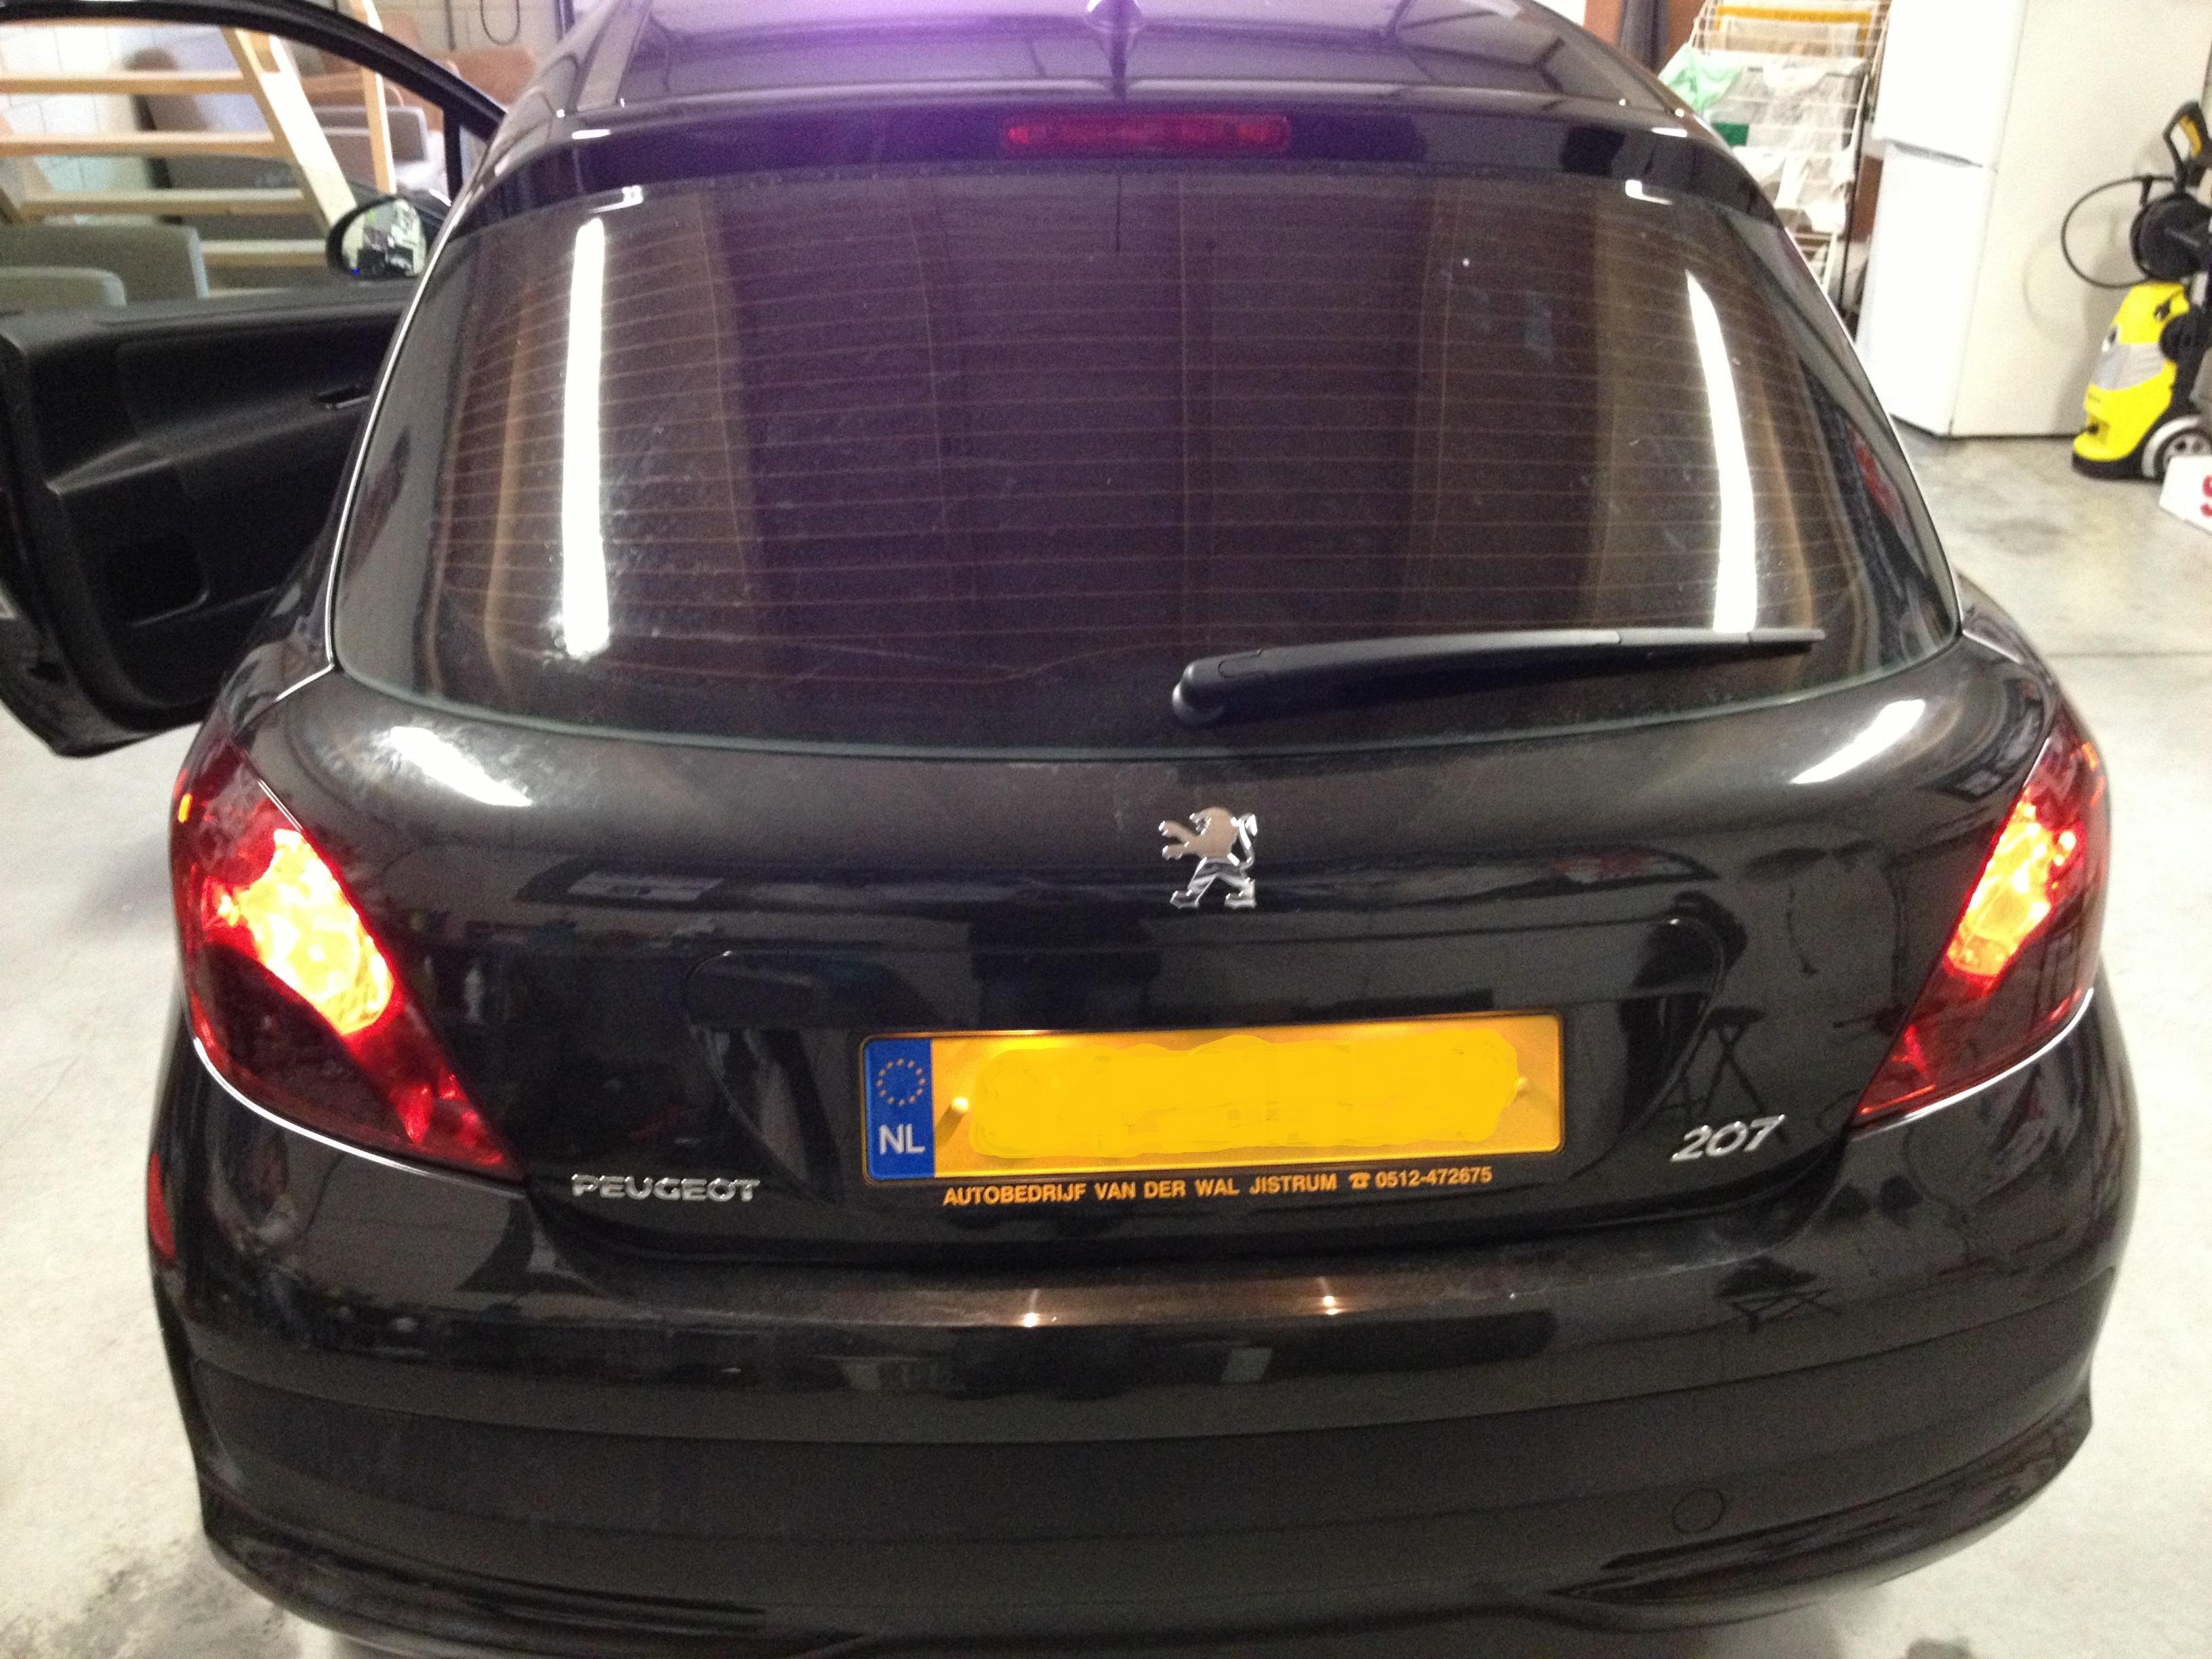 Peugeot | Auto Ramen Blinderen / Tinten - Pro-Autostyling - Part 4